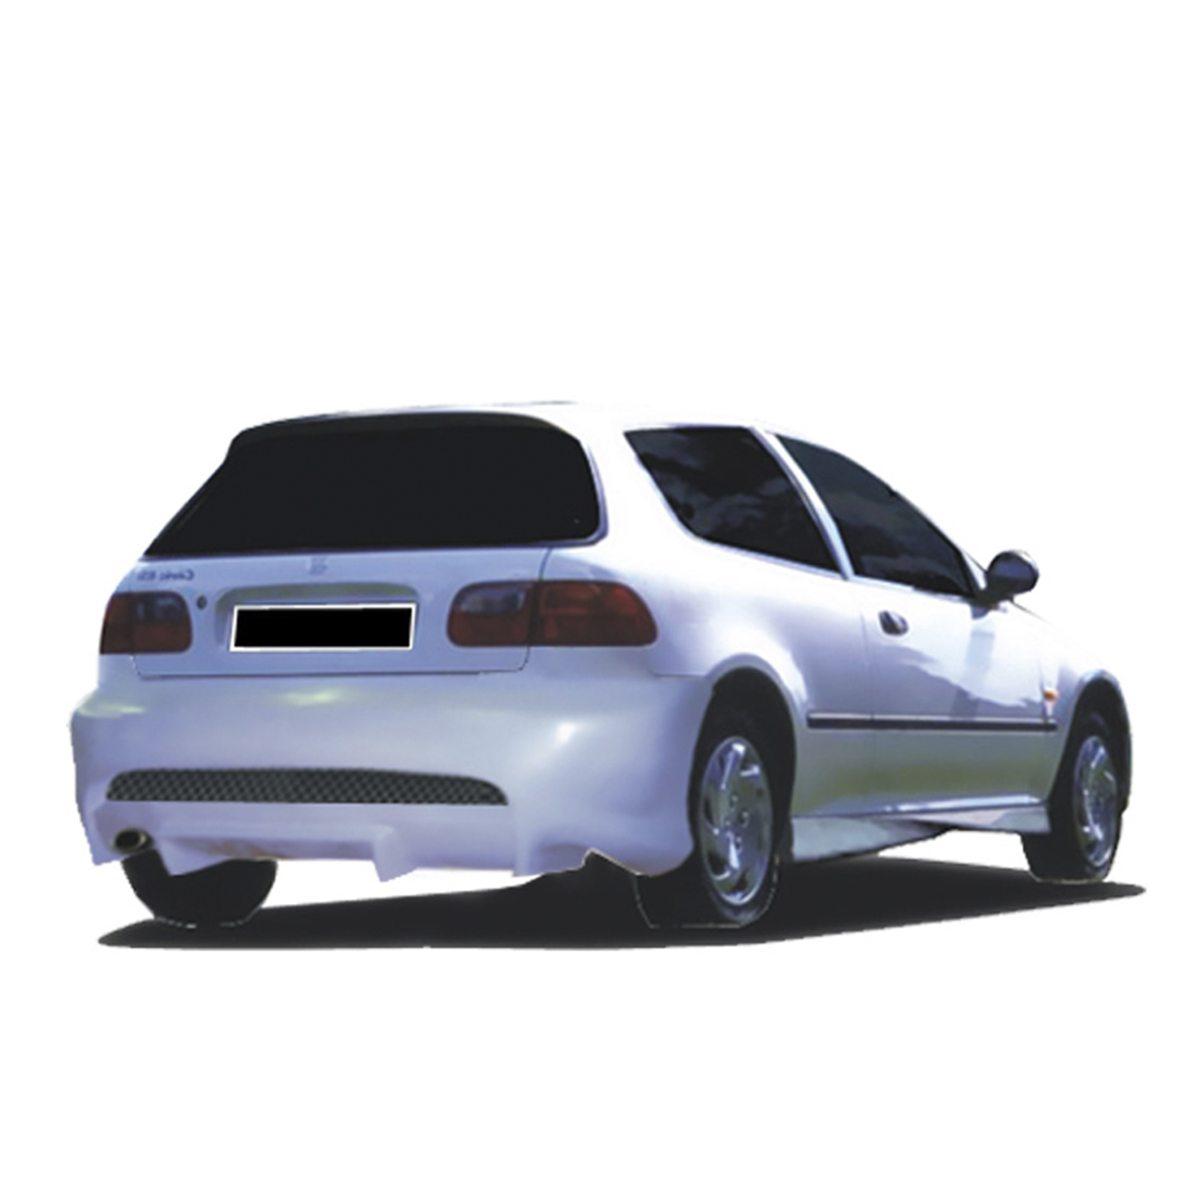 Honda-Civic-92-Flash-Tras-PCU0367.4